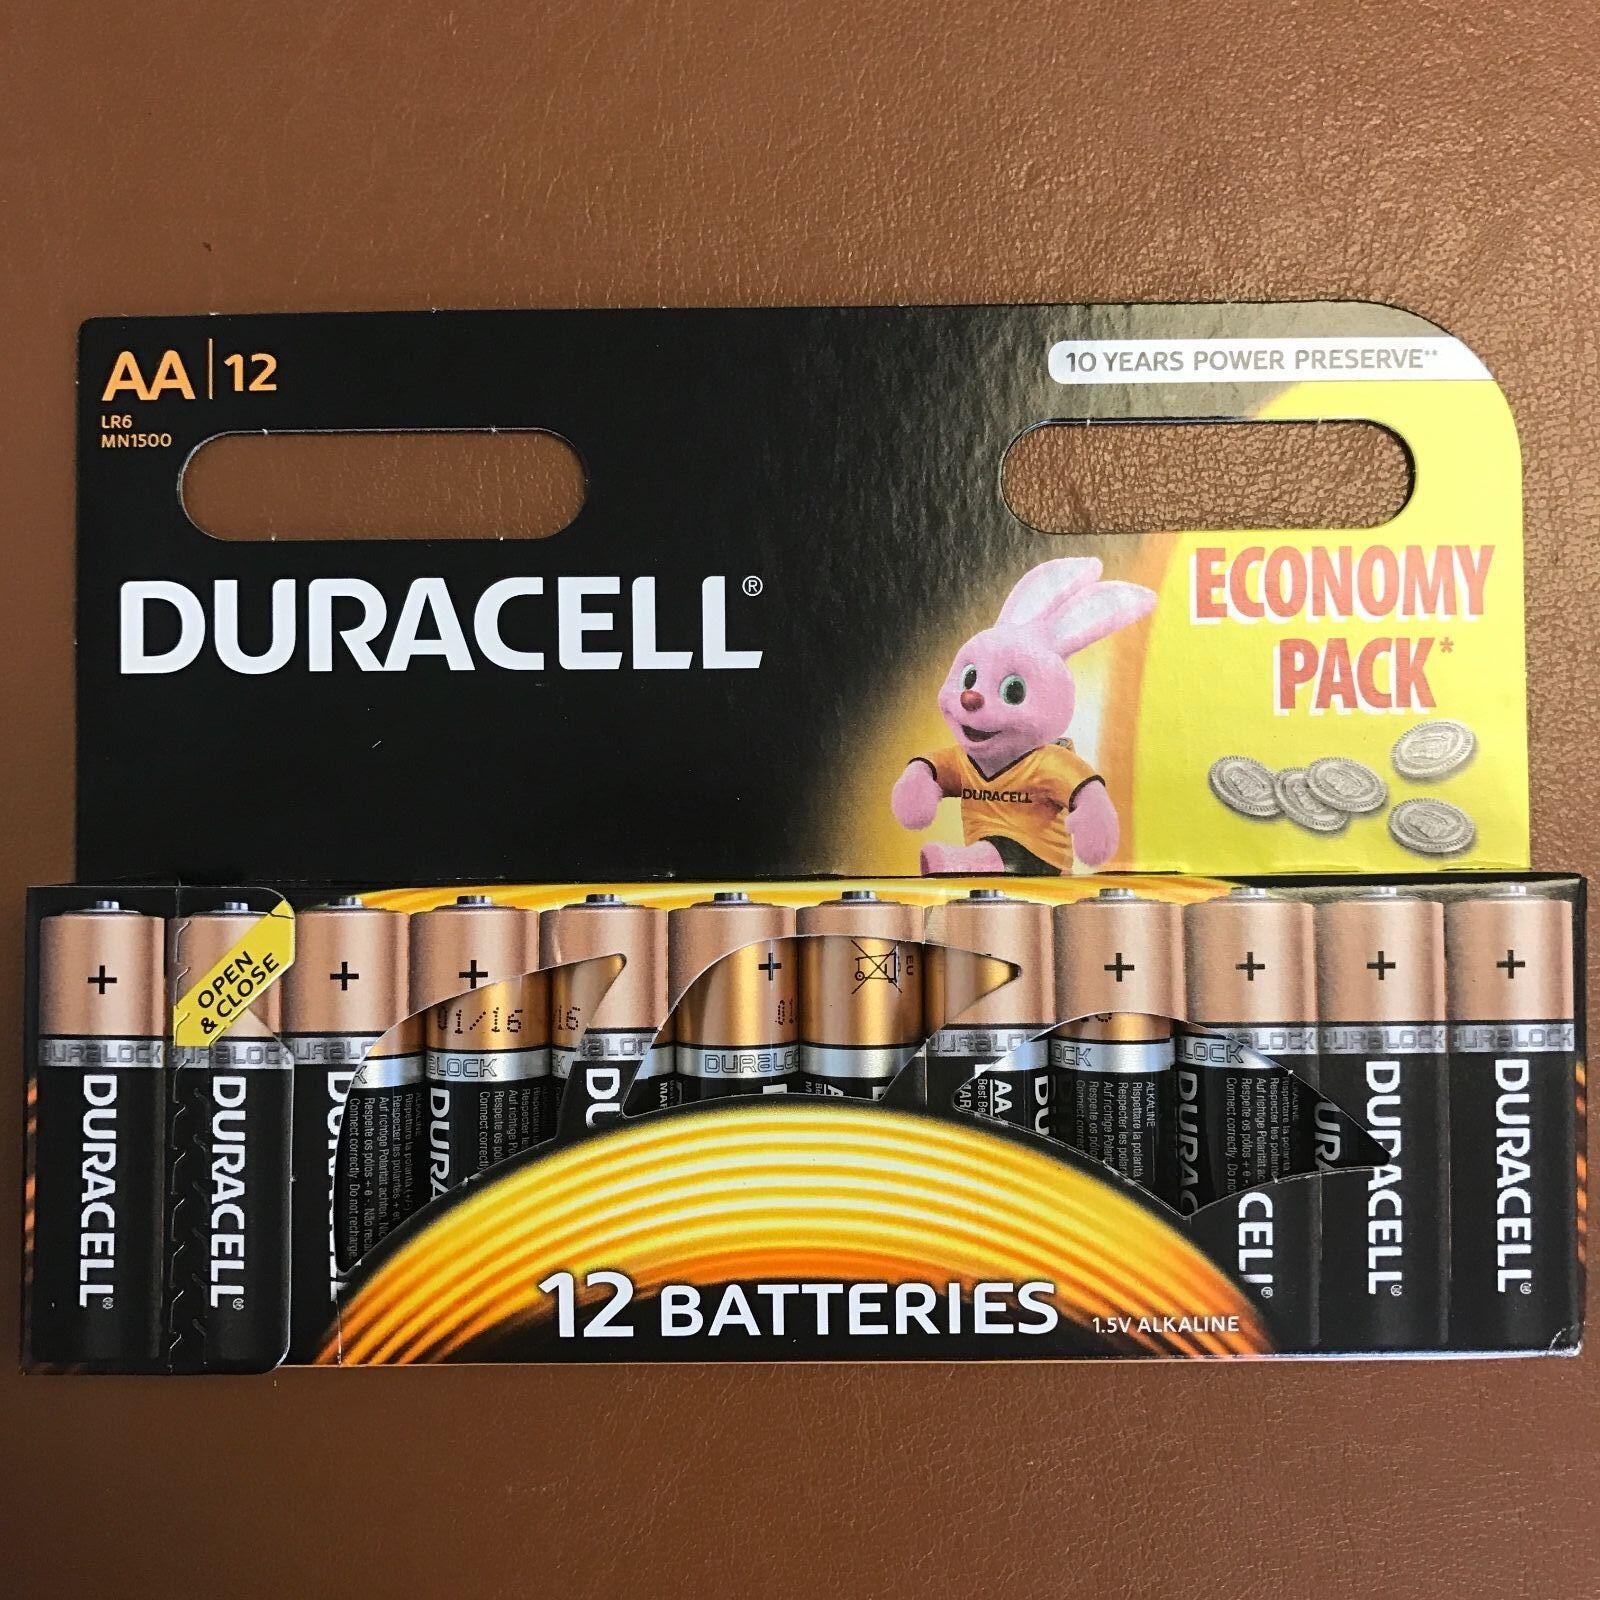 Duracell AA Long Lasting Power Alkaline Battery Economy Pack 12 Batteries LR6